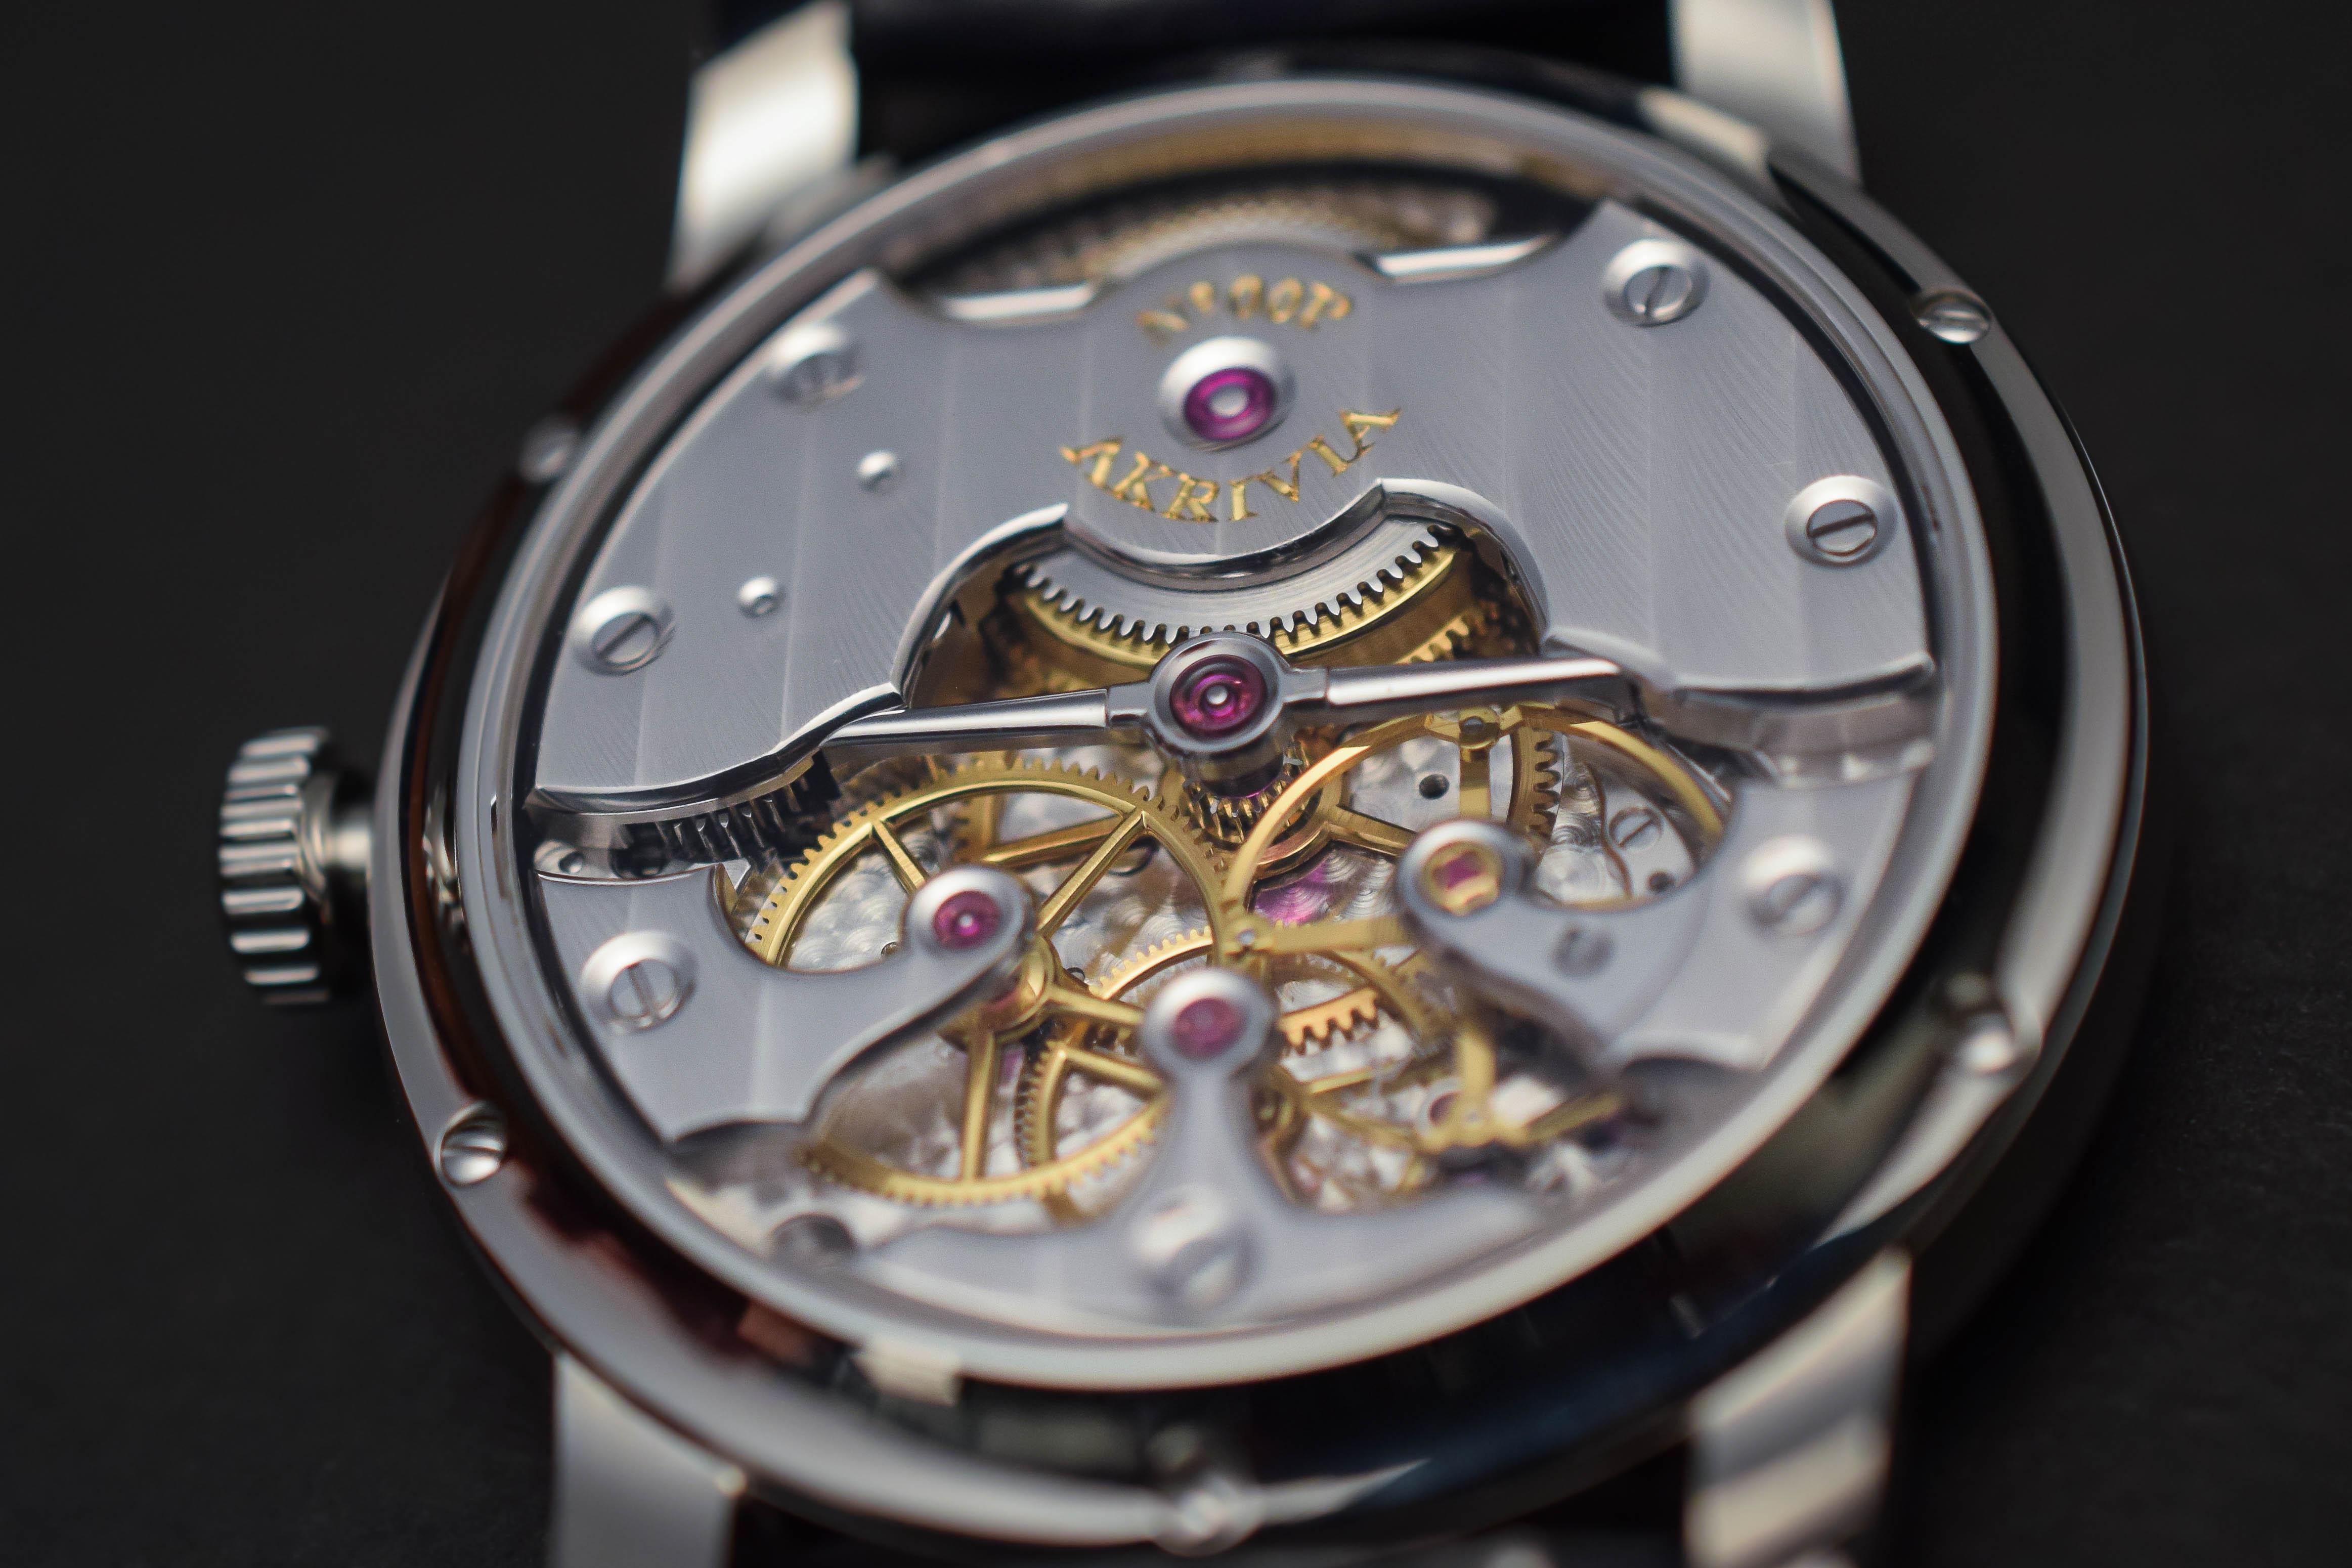 AkriviA Rexhep Rexhepi Chronometre Contemporain - 3